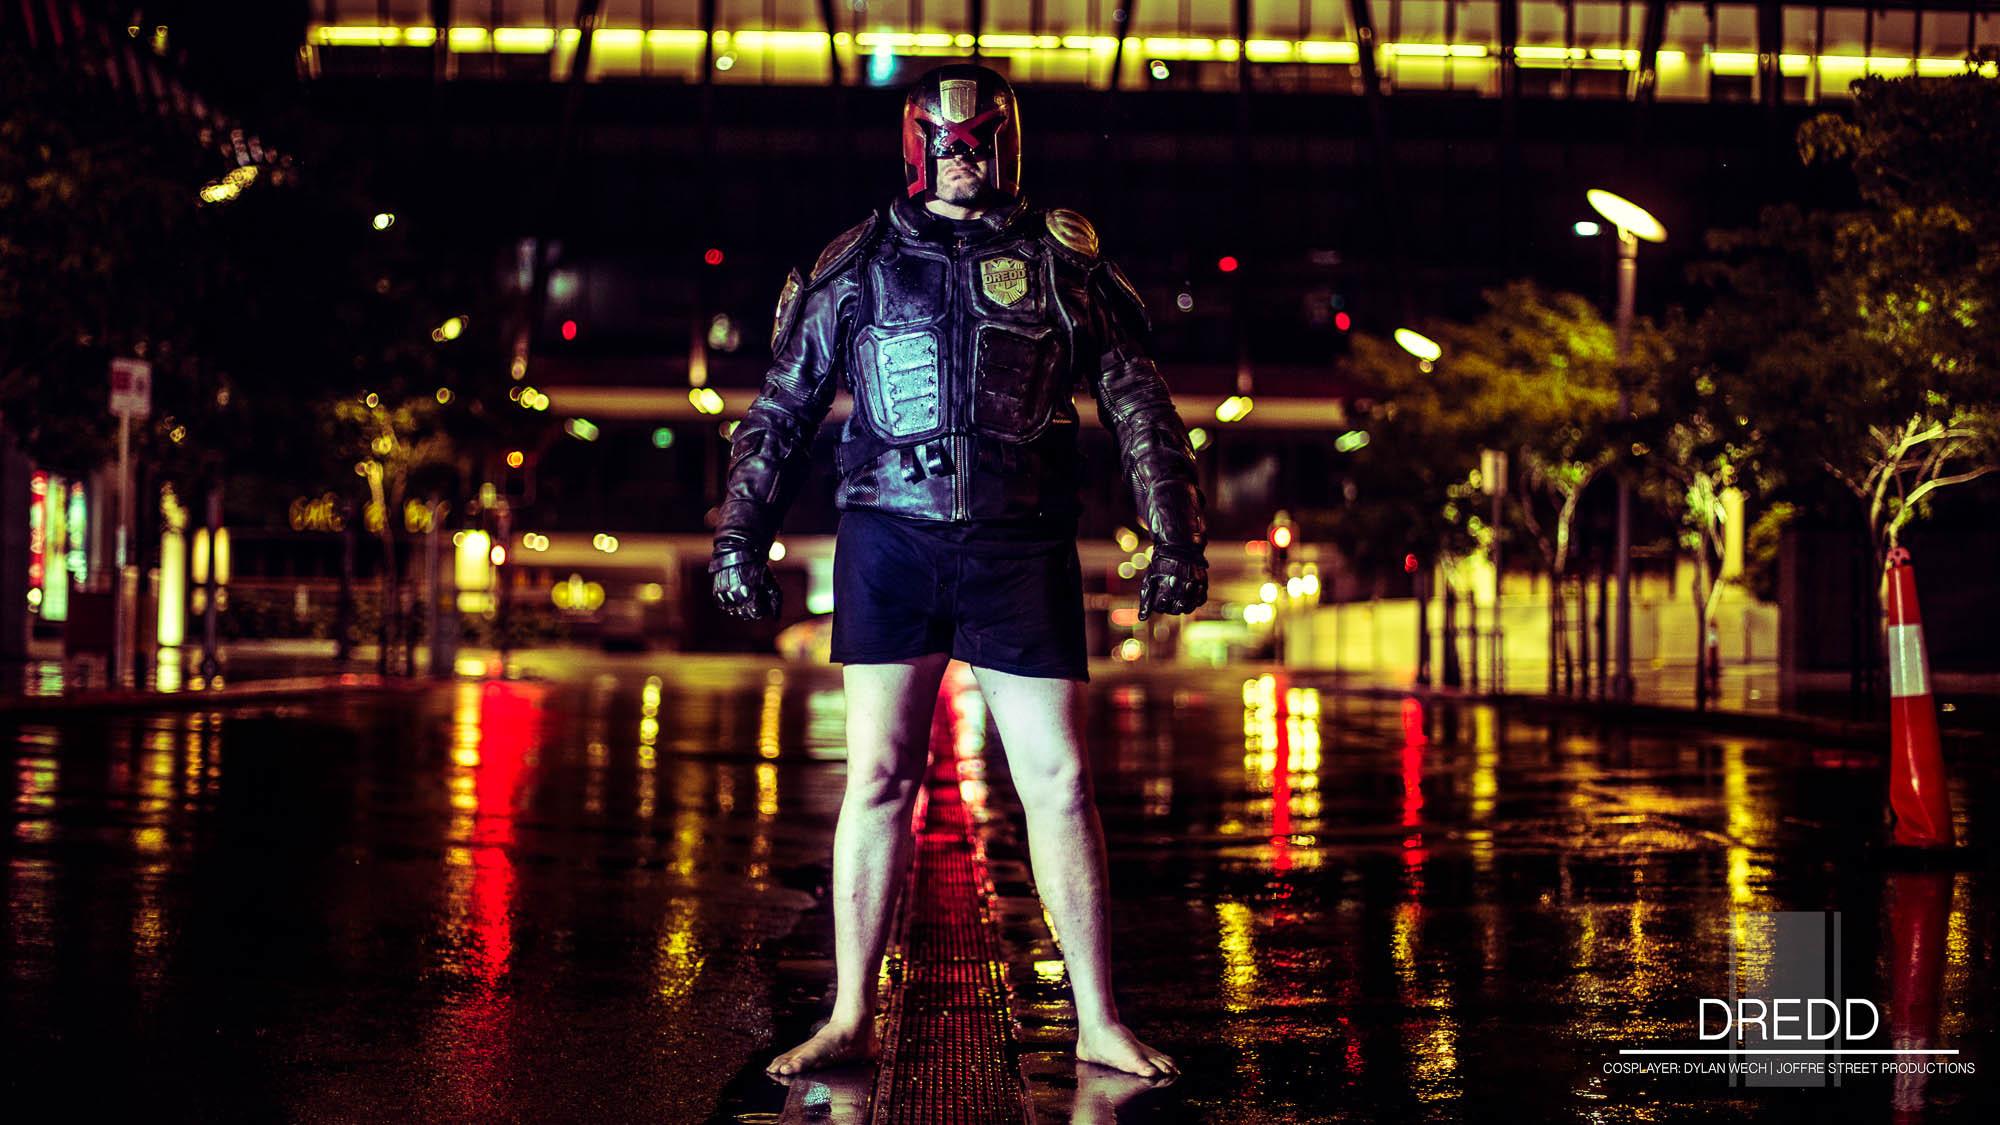 The lost scene from Dredd 3D